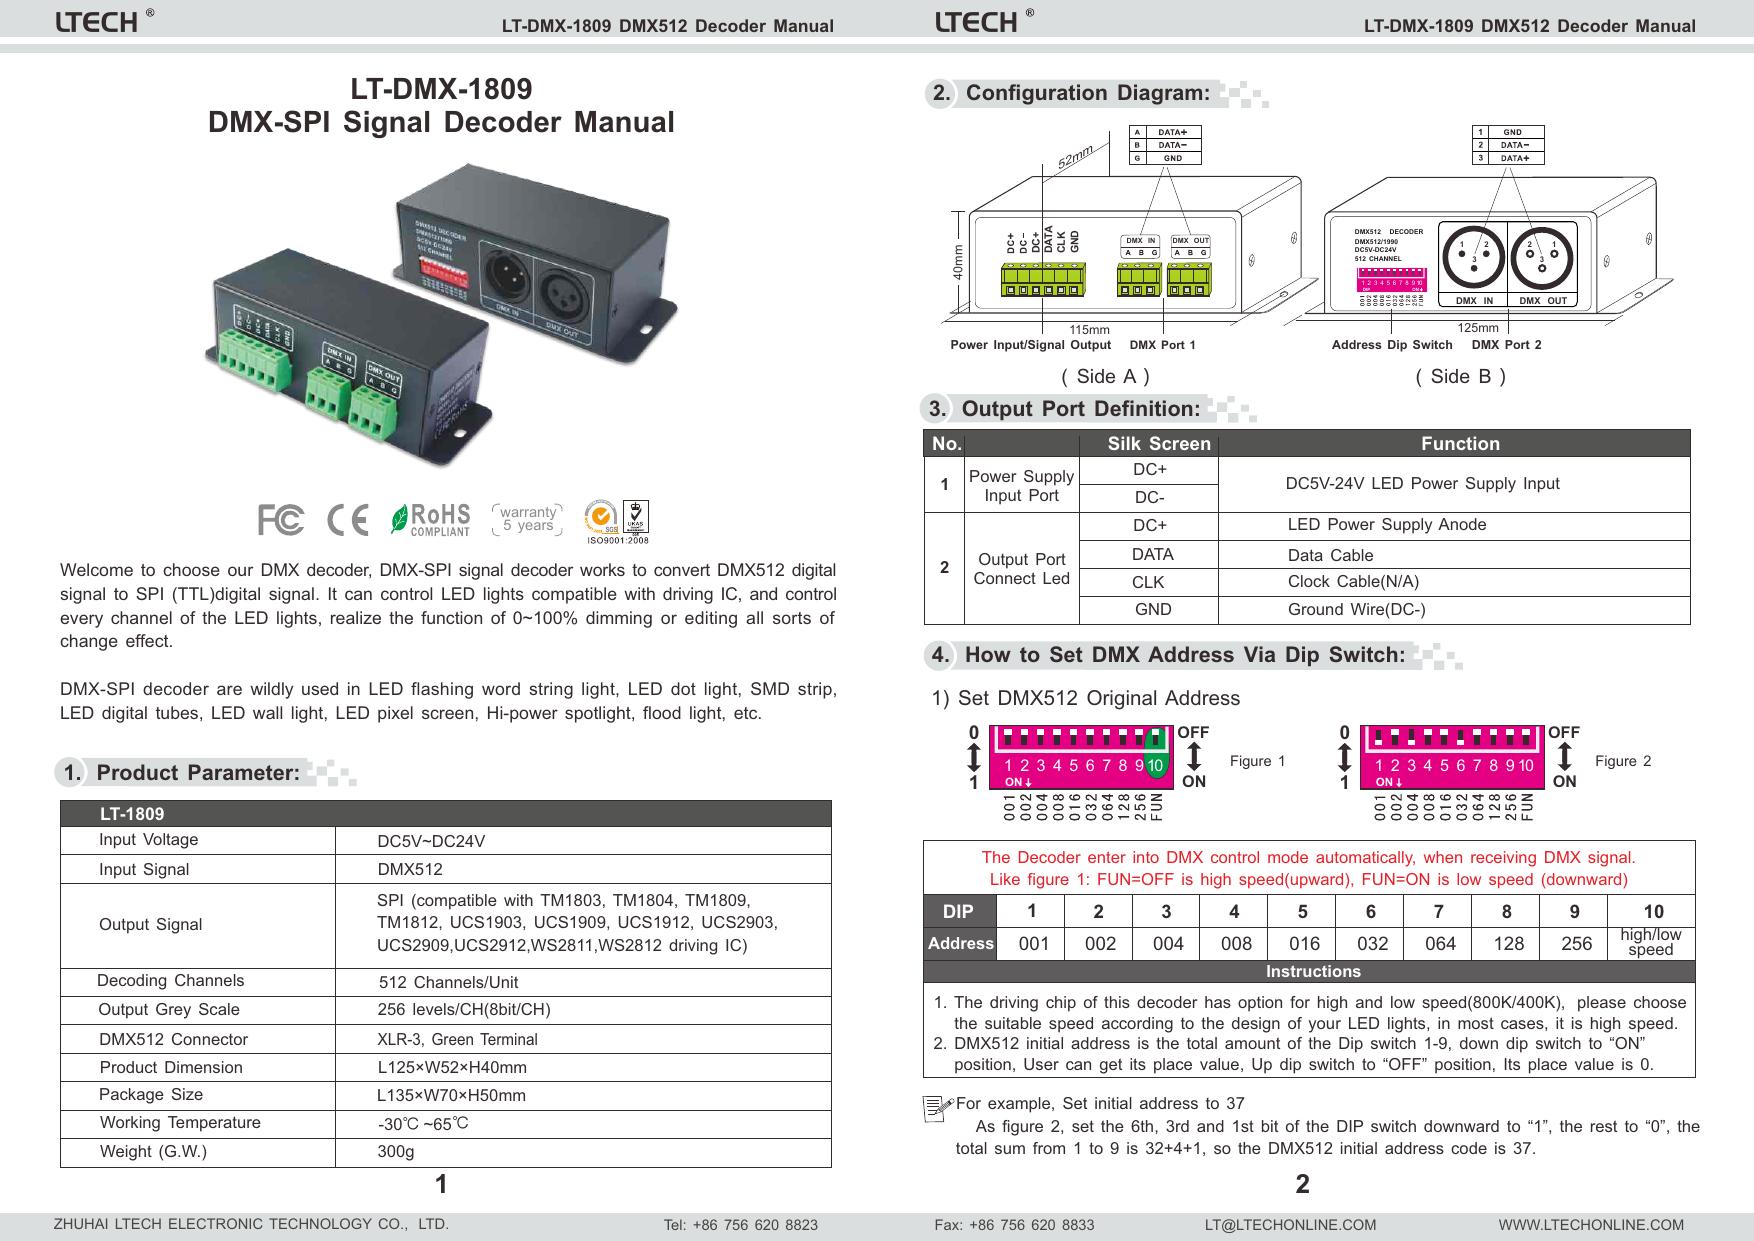 LT-1809 DMX512 DECODER-G20140101 cdr | manualzz com